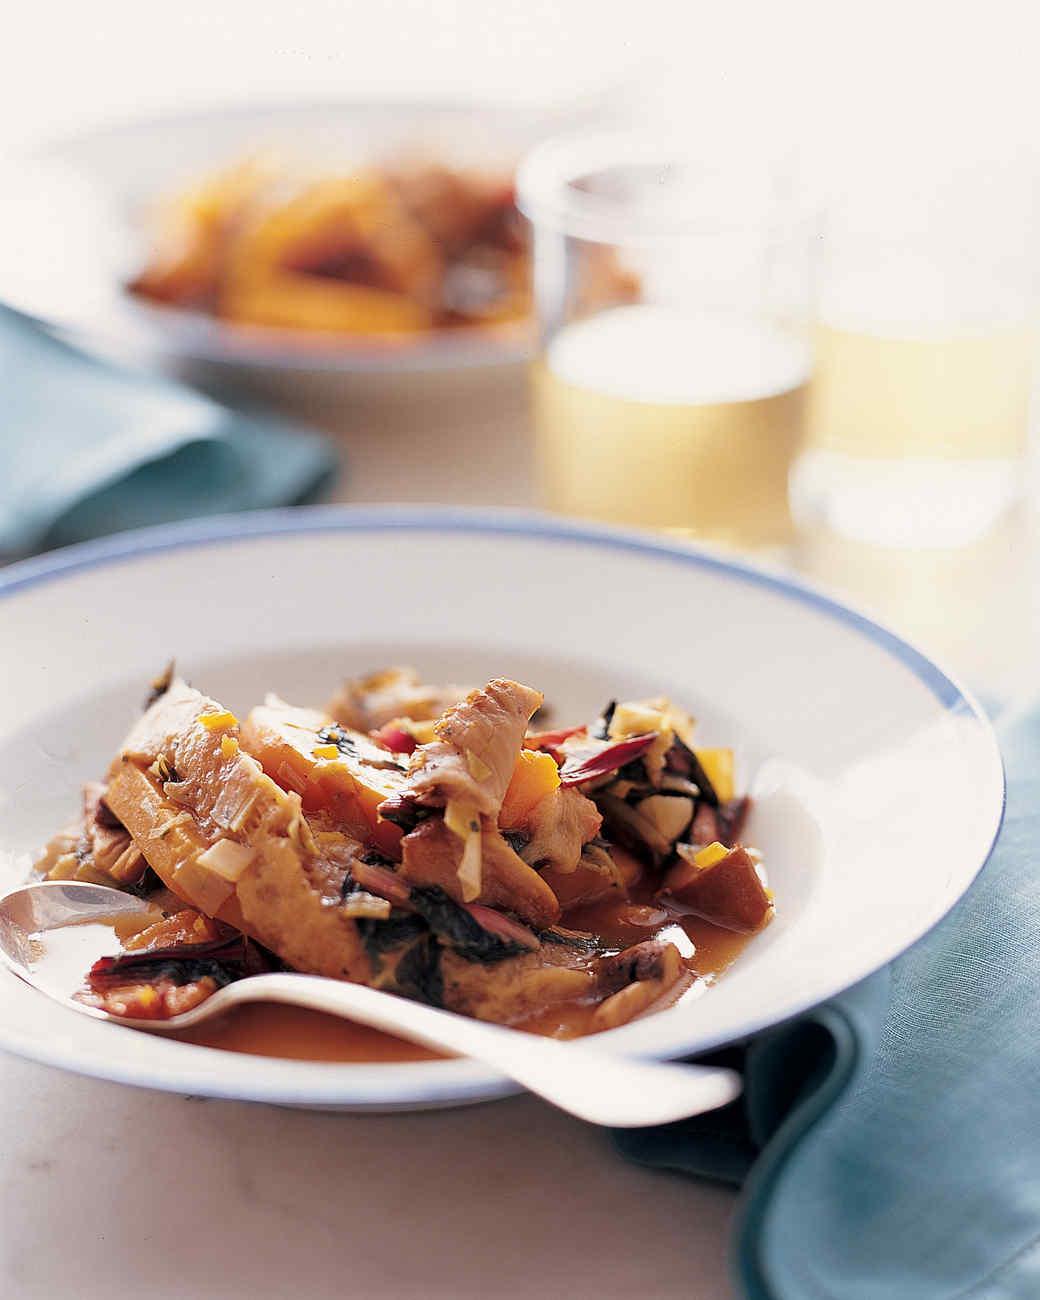 Squash Panada with Wild Mushrooms and Chard